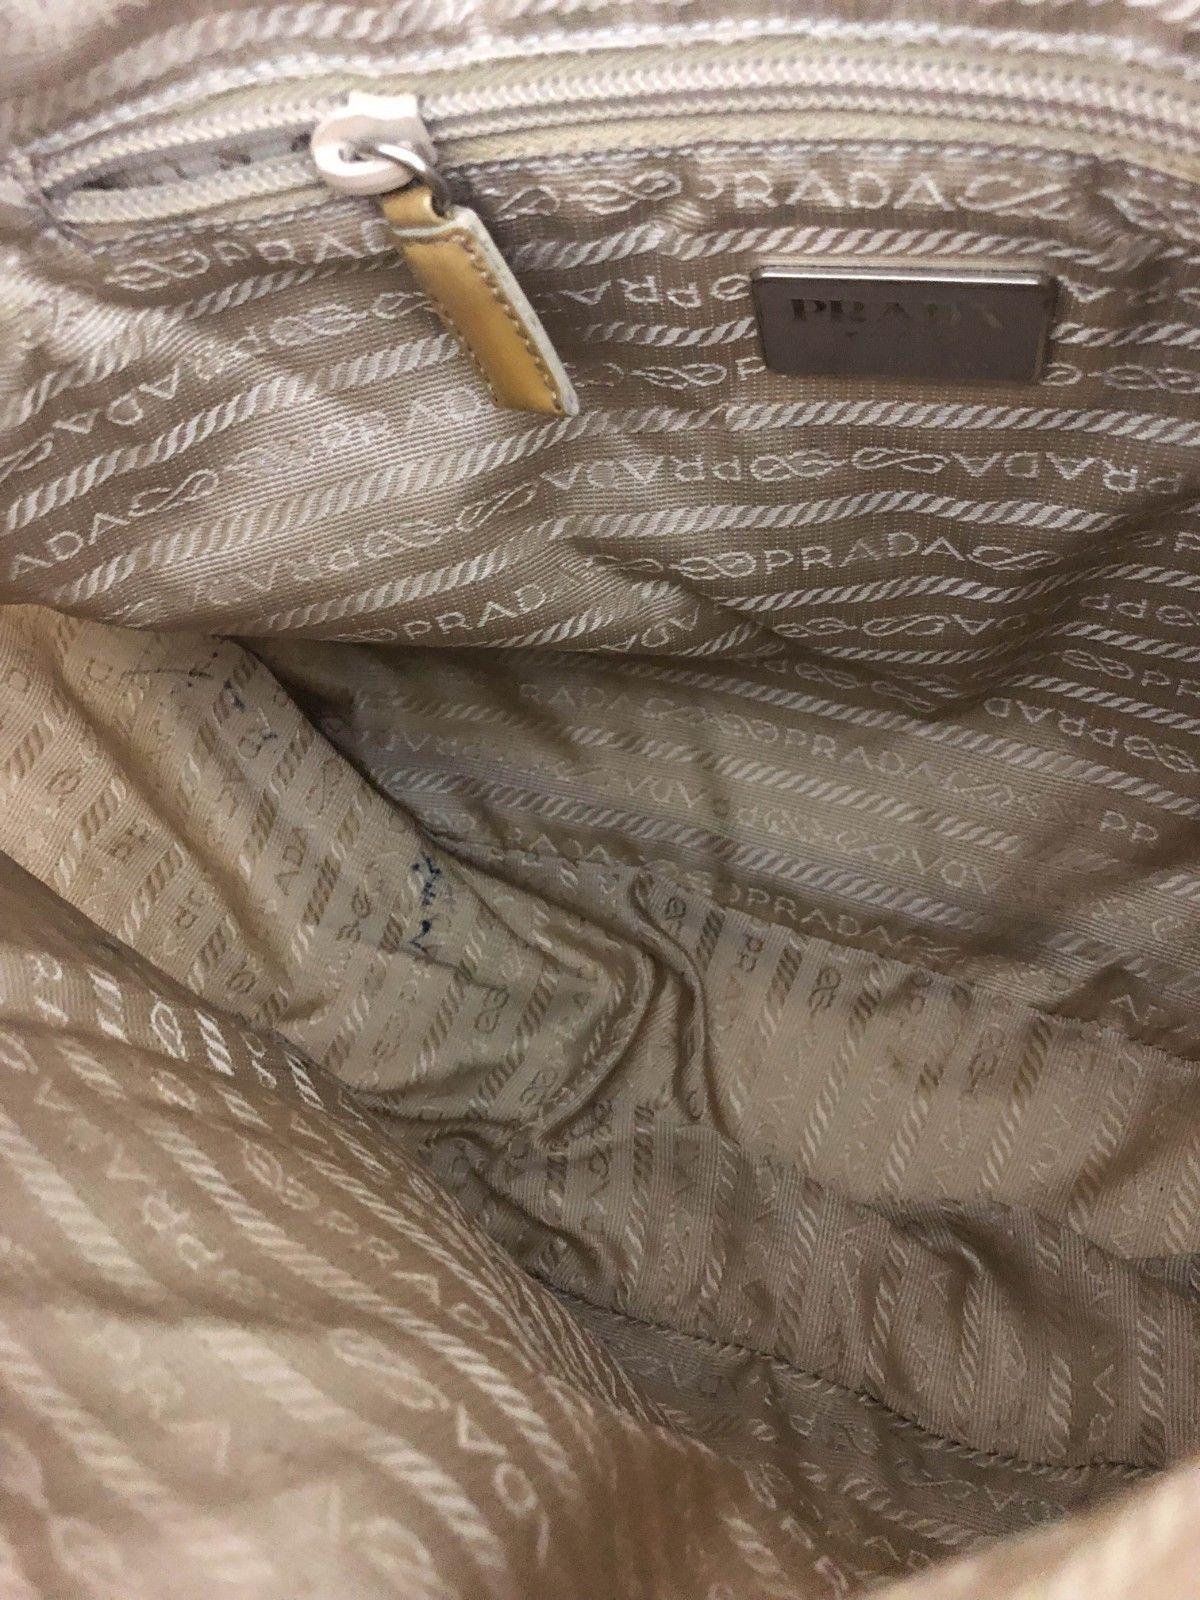 076a8287363b Prada Nylon Black Bag Leather Straps White Stitching Silver Buckles Clasps  Ziper  84.0  prada